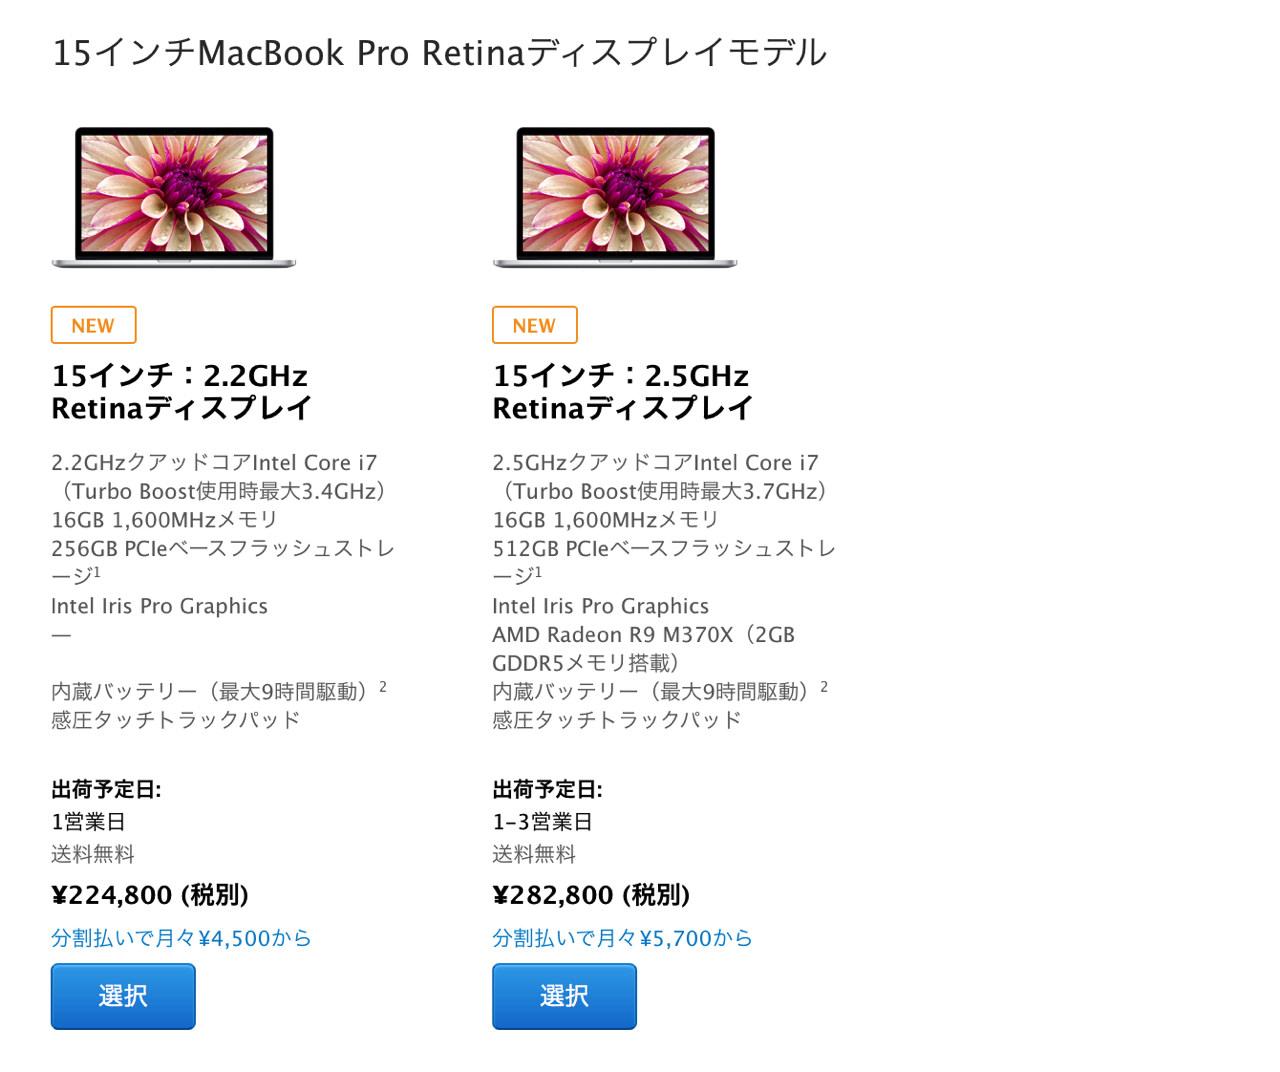 Macbook pro retina mid 20151